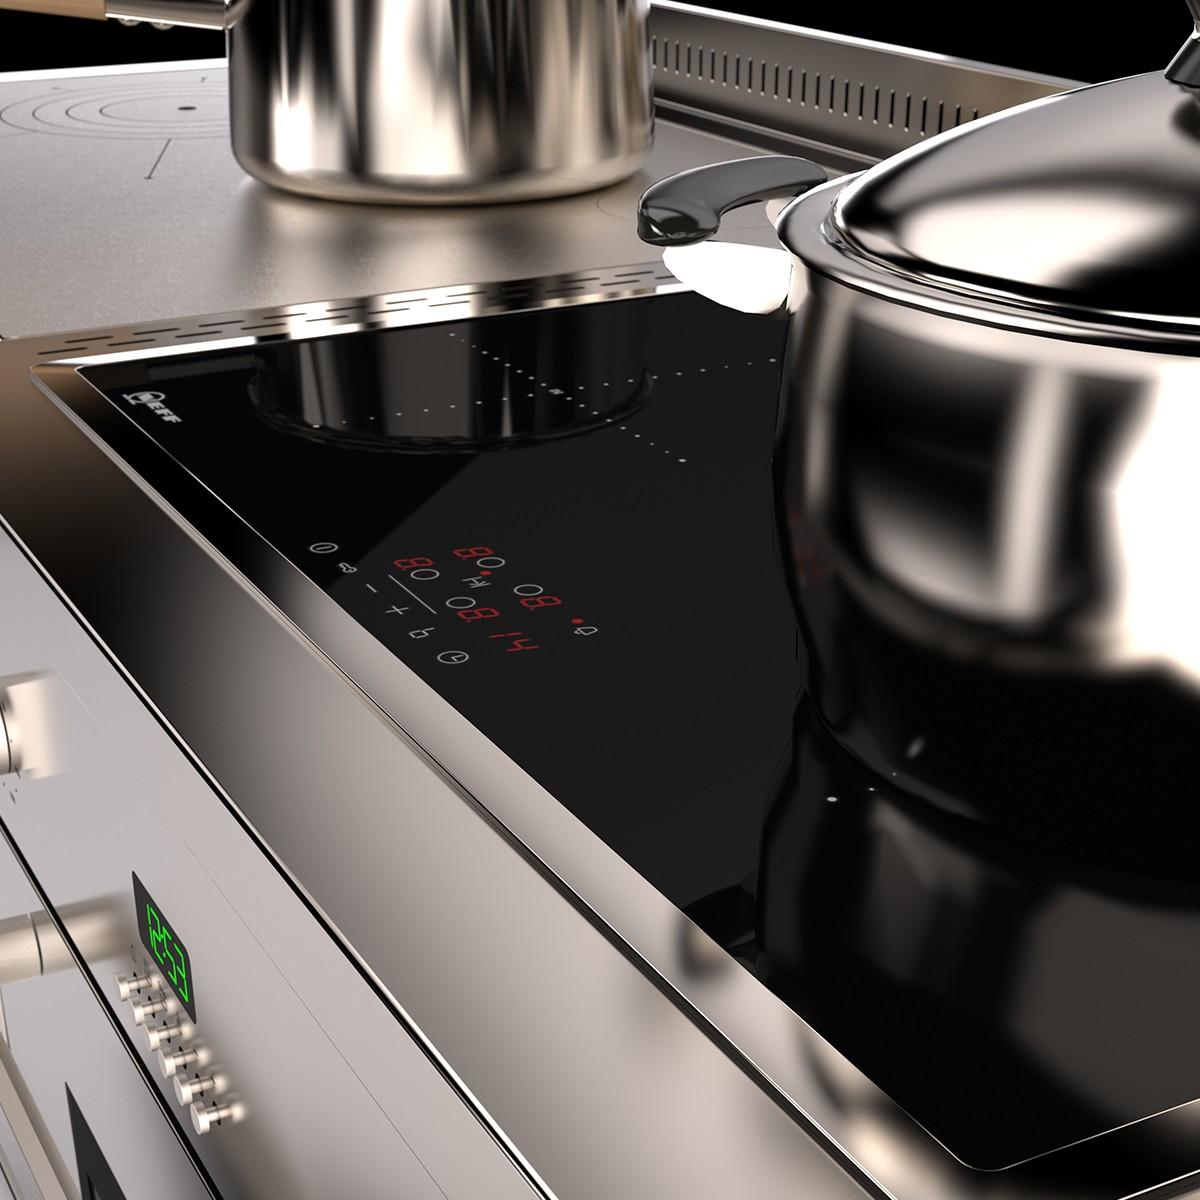 Cucine a gas ed elettriche